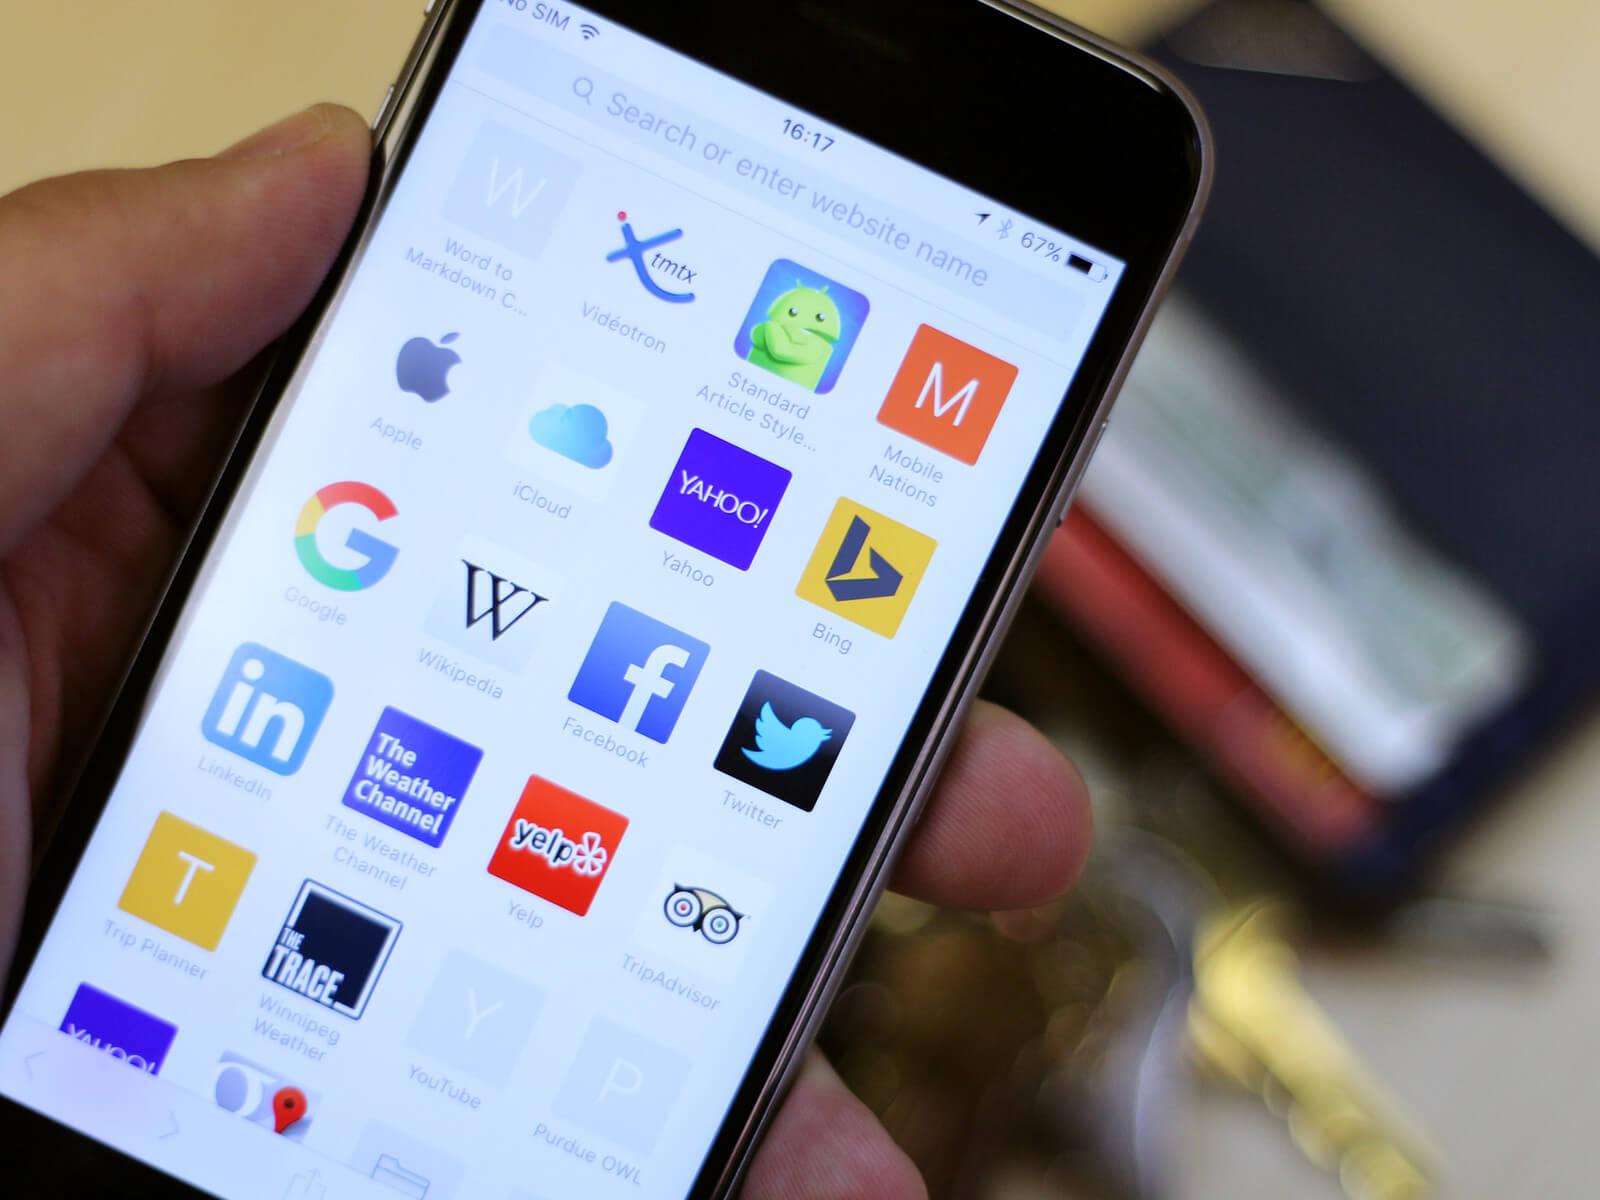 Salvare immagini su iphone navigando da Safari